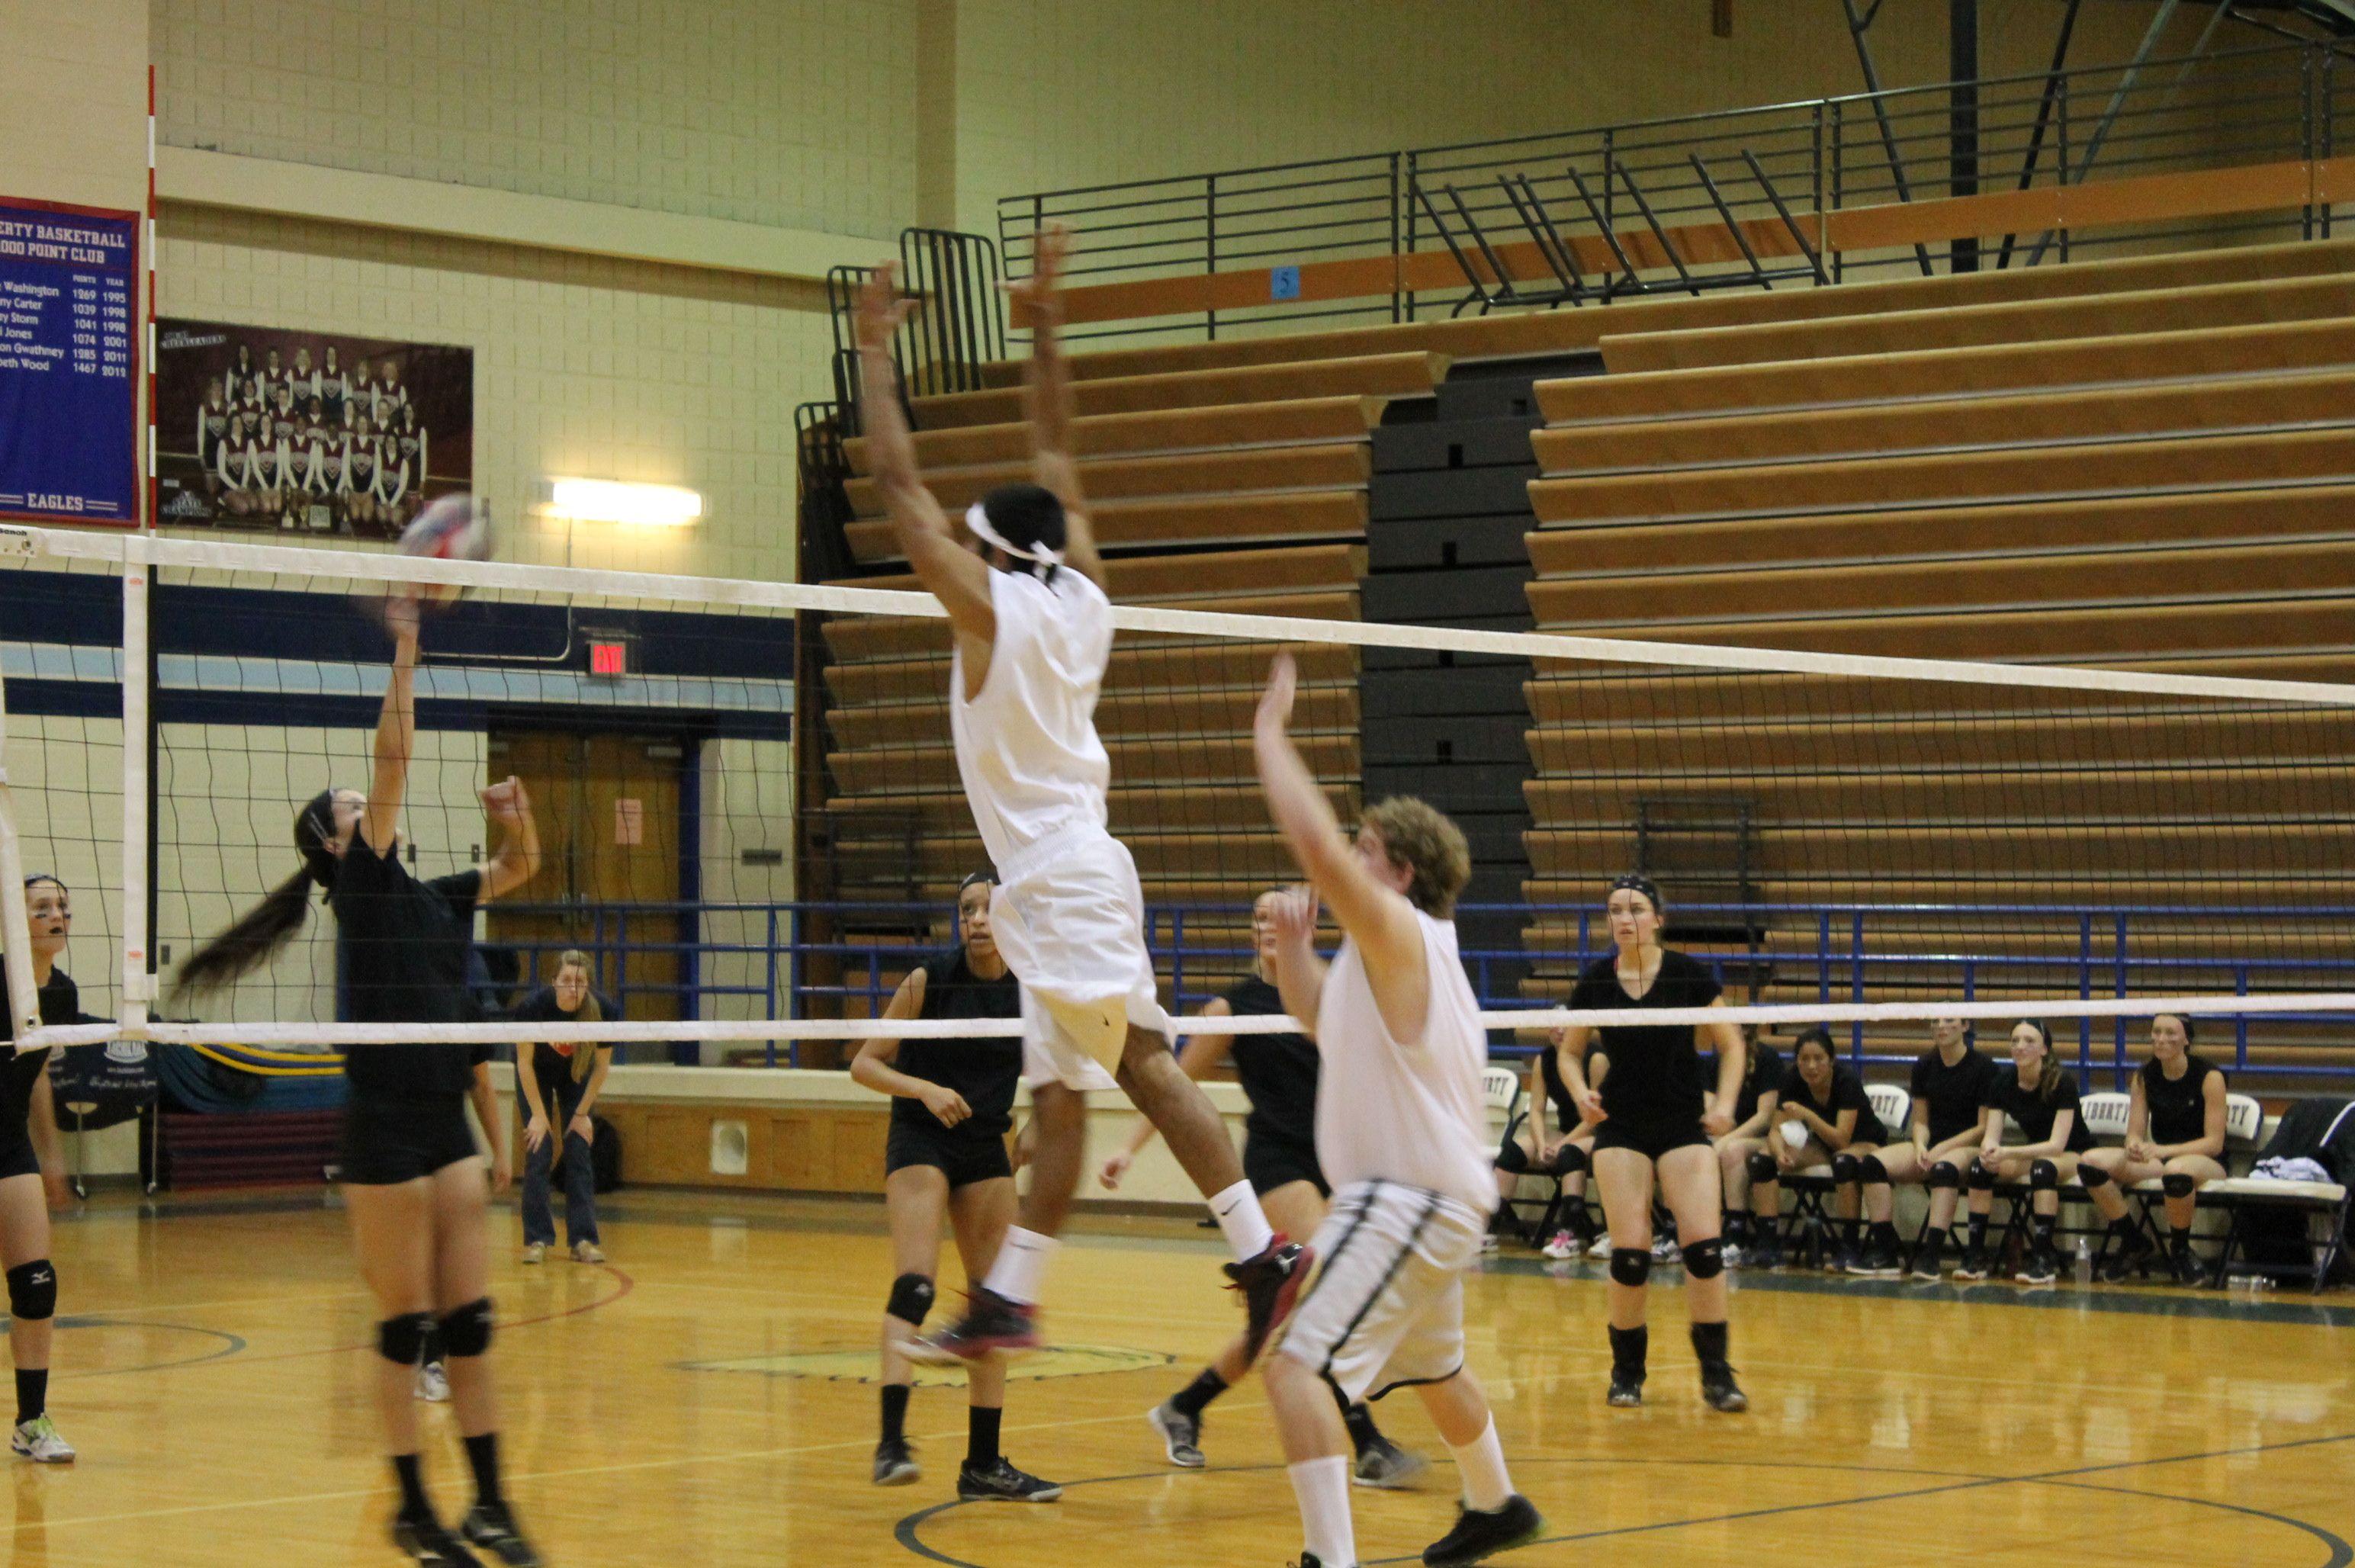 Volleyball Fundraiser 2014 Volleyball Fundraiser Liberty High School Volleyball